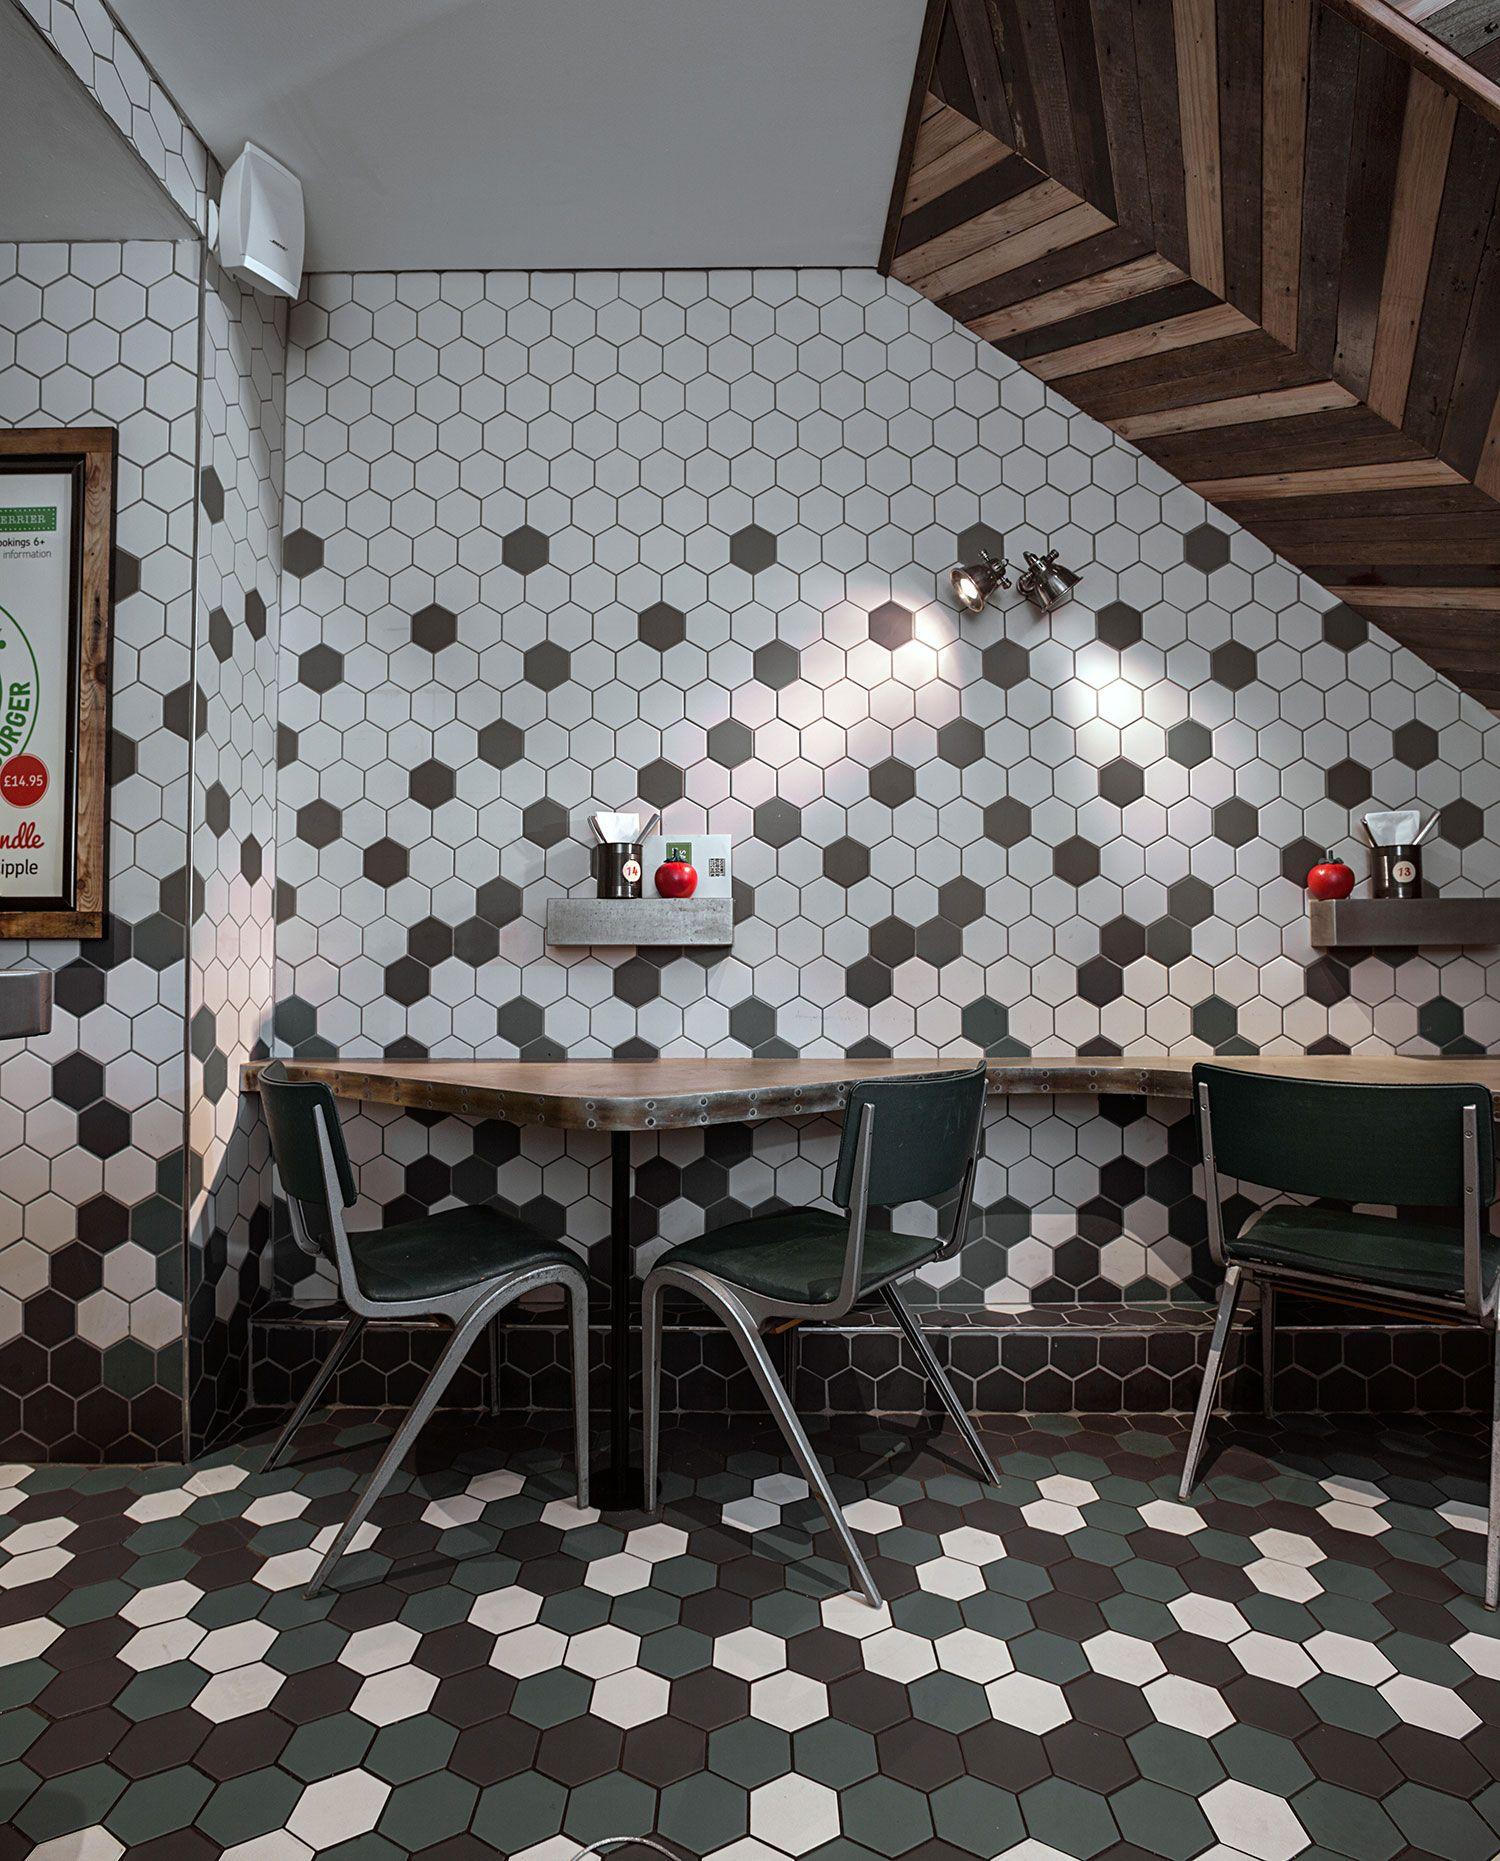 Ceramic Tiles Solus Honeycomb Tile Tile Design Home Decor Inspiration